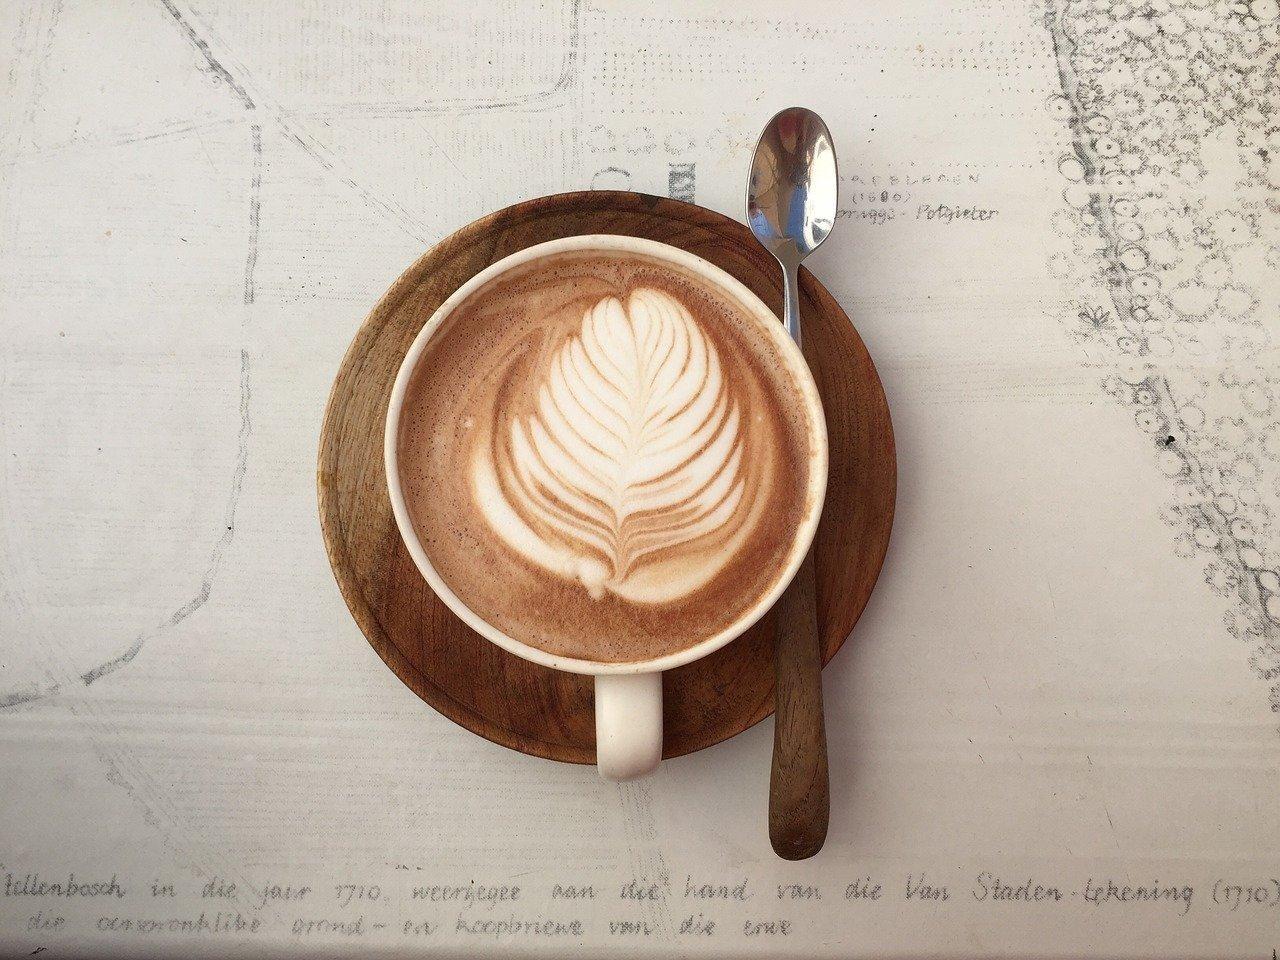 MB 02-20 - Kaffee